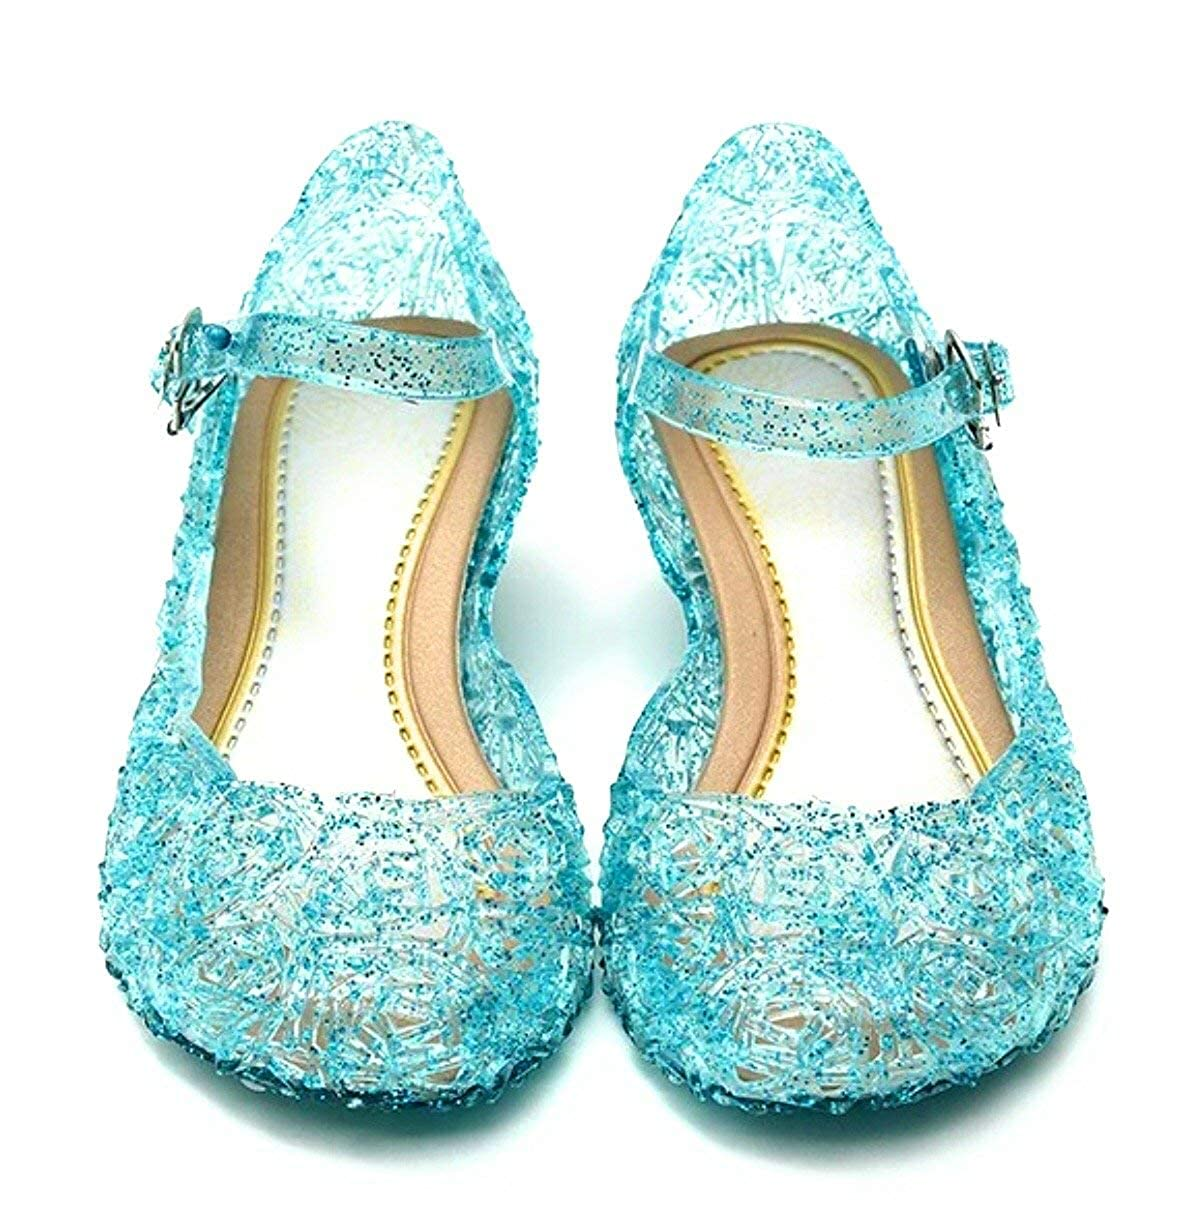 fa1161826830 Amazon.com  Mina + Willie Girls Mary Jane Jelly Shoes  Shoes